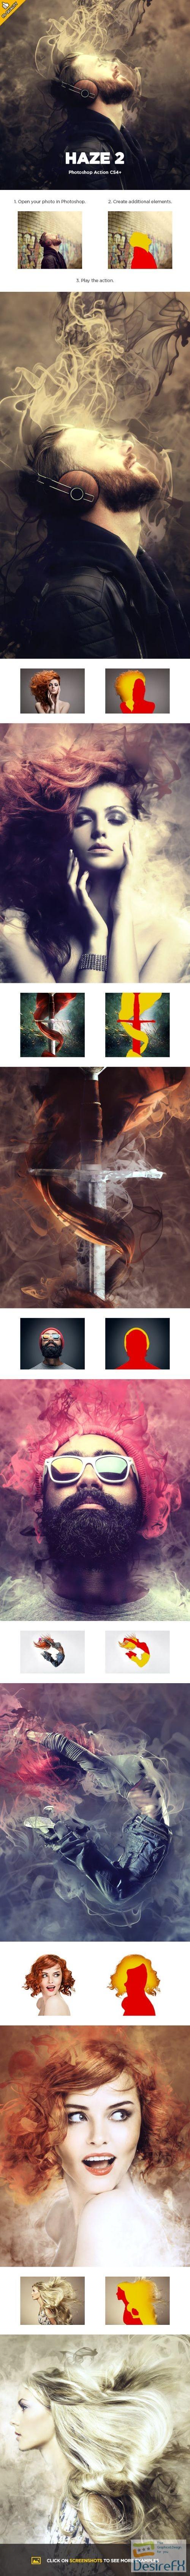 actions-atn - GraphicRiver - Haze 2 CS4+ Photoshop Action 23310795